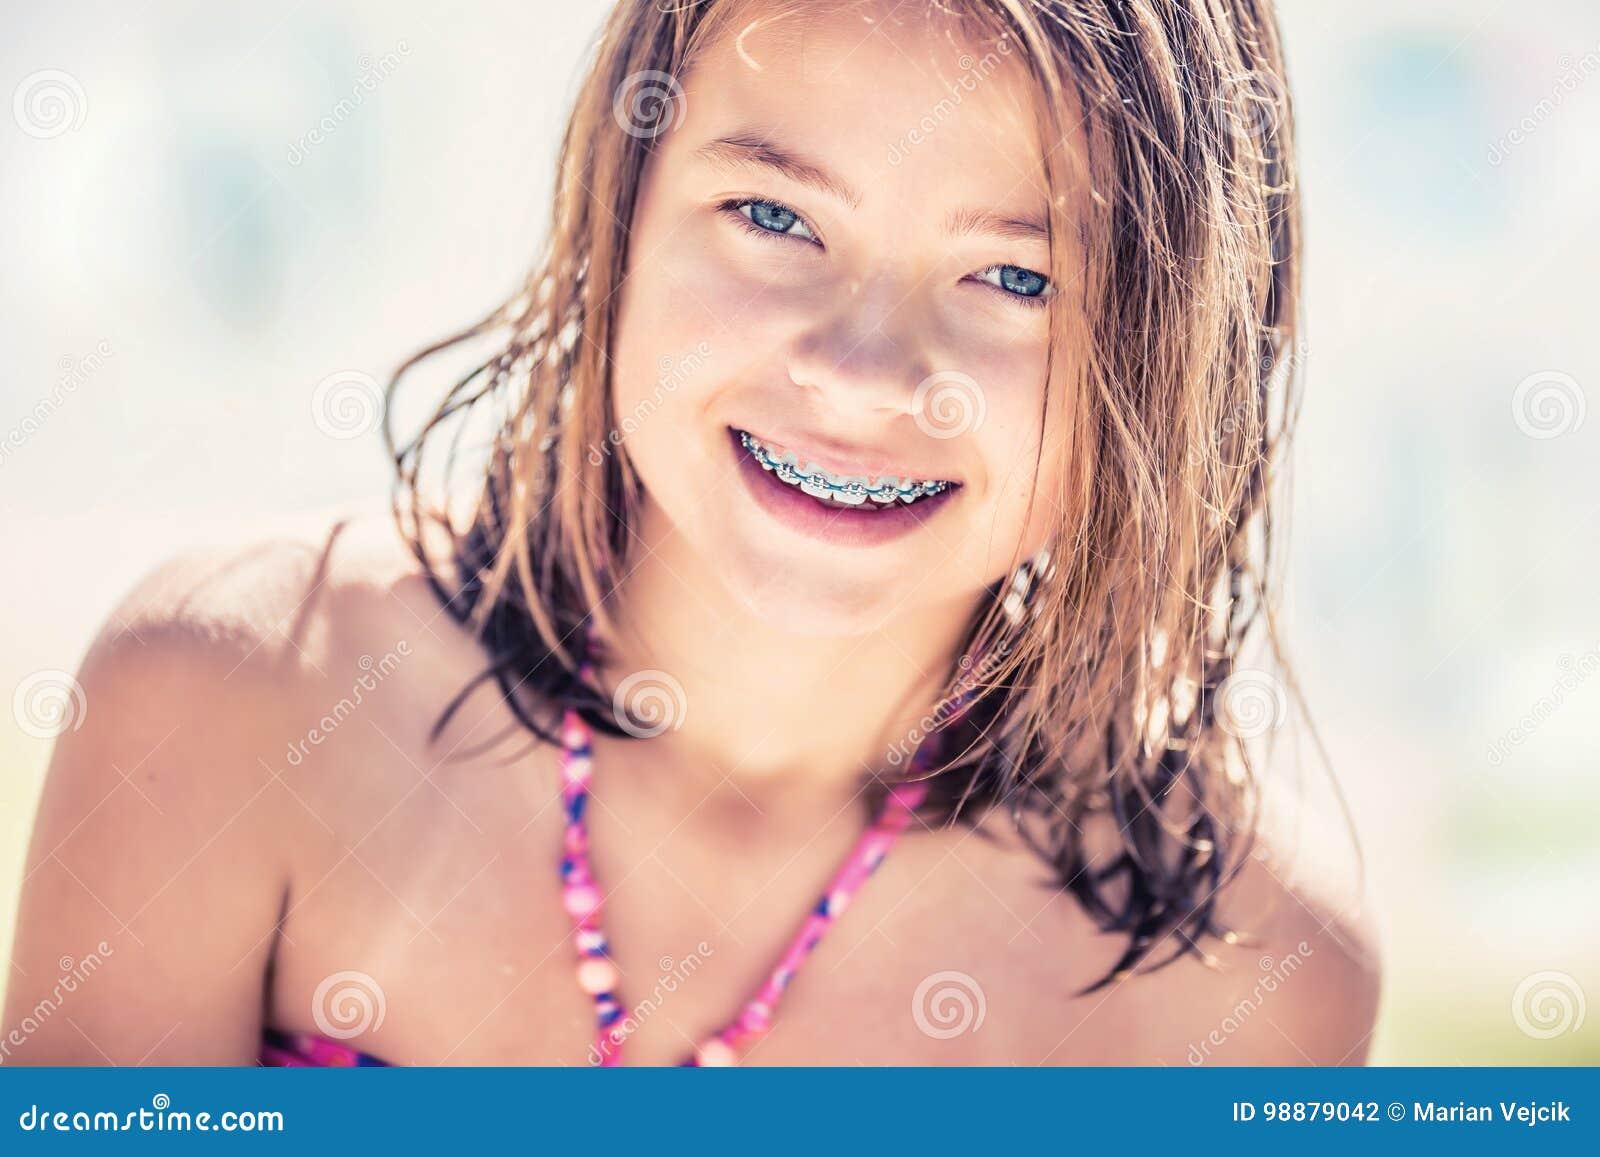 pre tiny bikini young